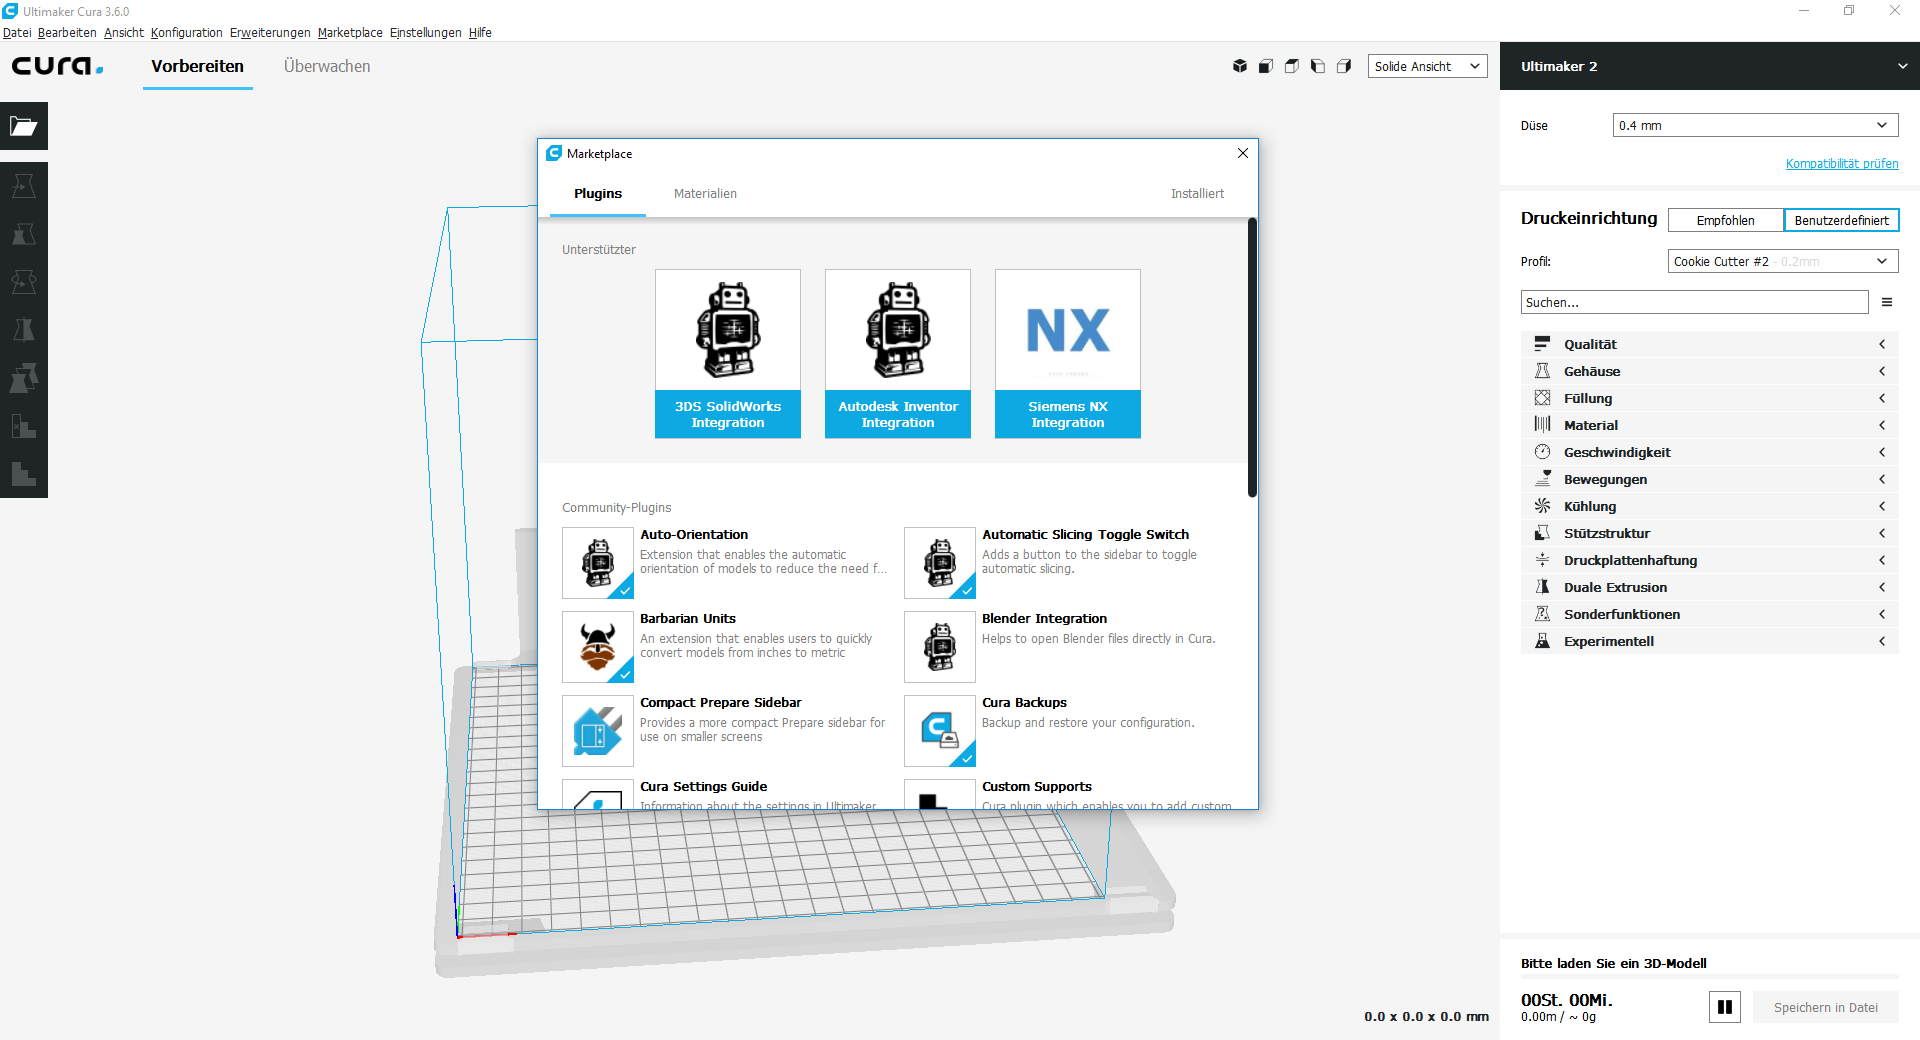 Screenshot des Maketplace in Cura 3.6.0